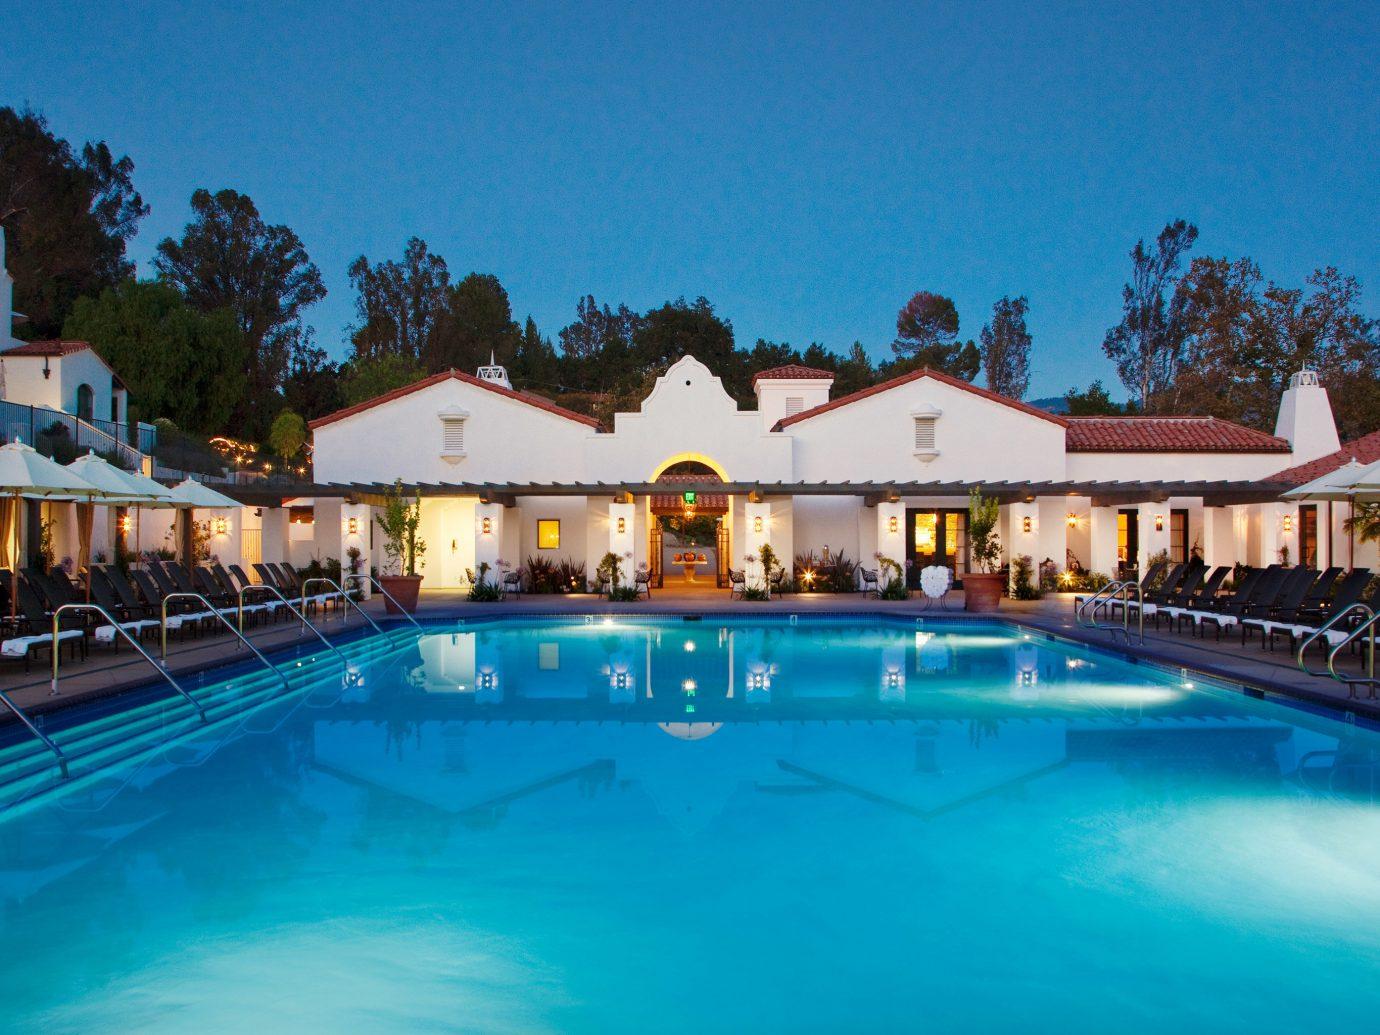 Eco Pool Style + Design water outdoor Resort swimming pool property leisure estate blue Villa resort town swimming mansion